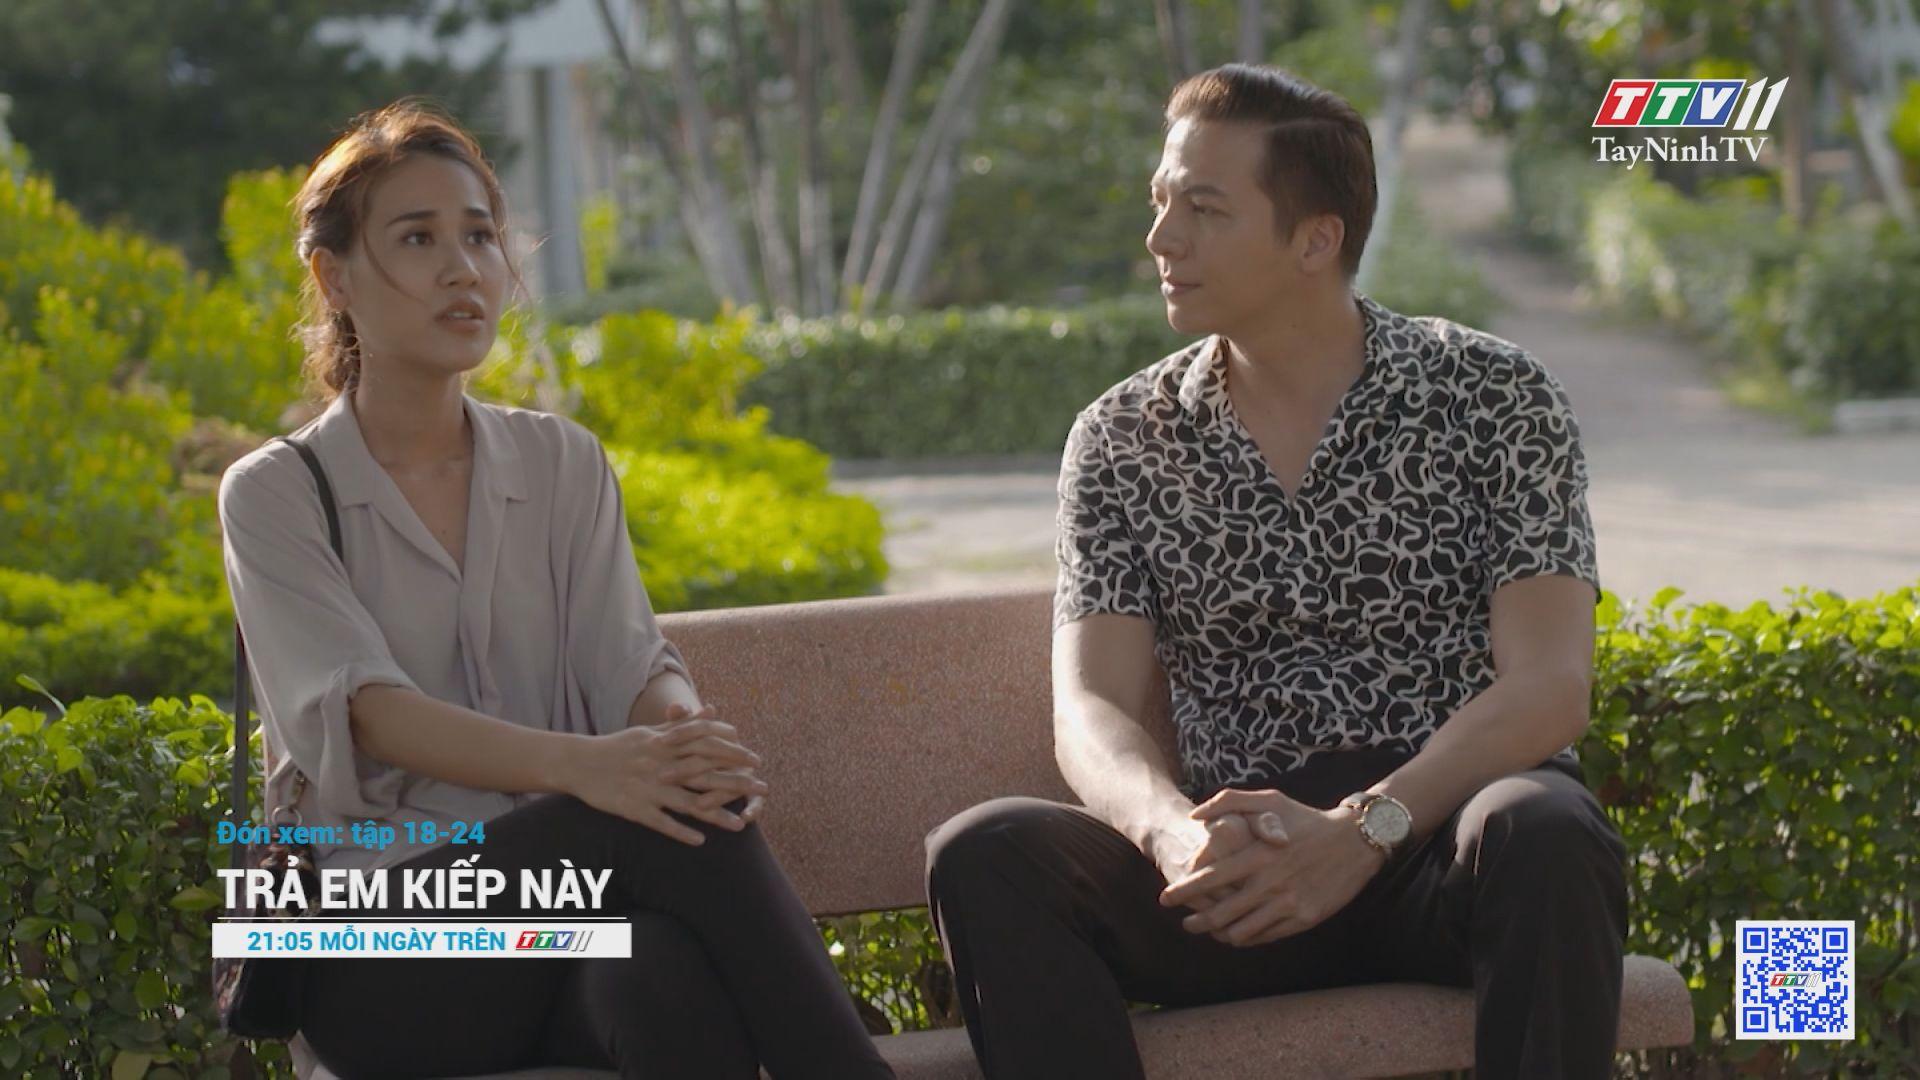 Phim TRẢ EM KIẾP NÀY-Tập 18 đến tập 24 Trailer | TayNinhTV